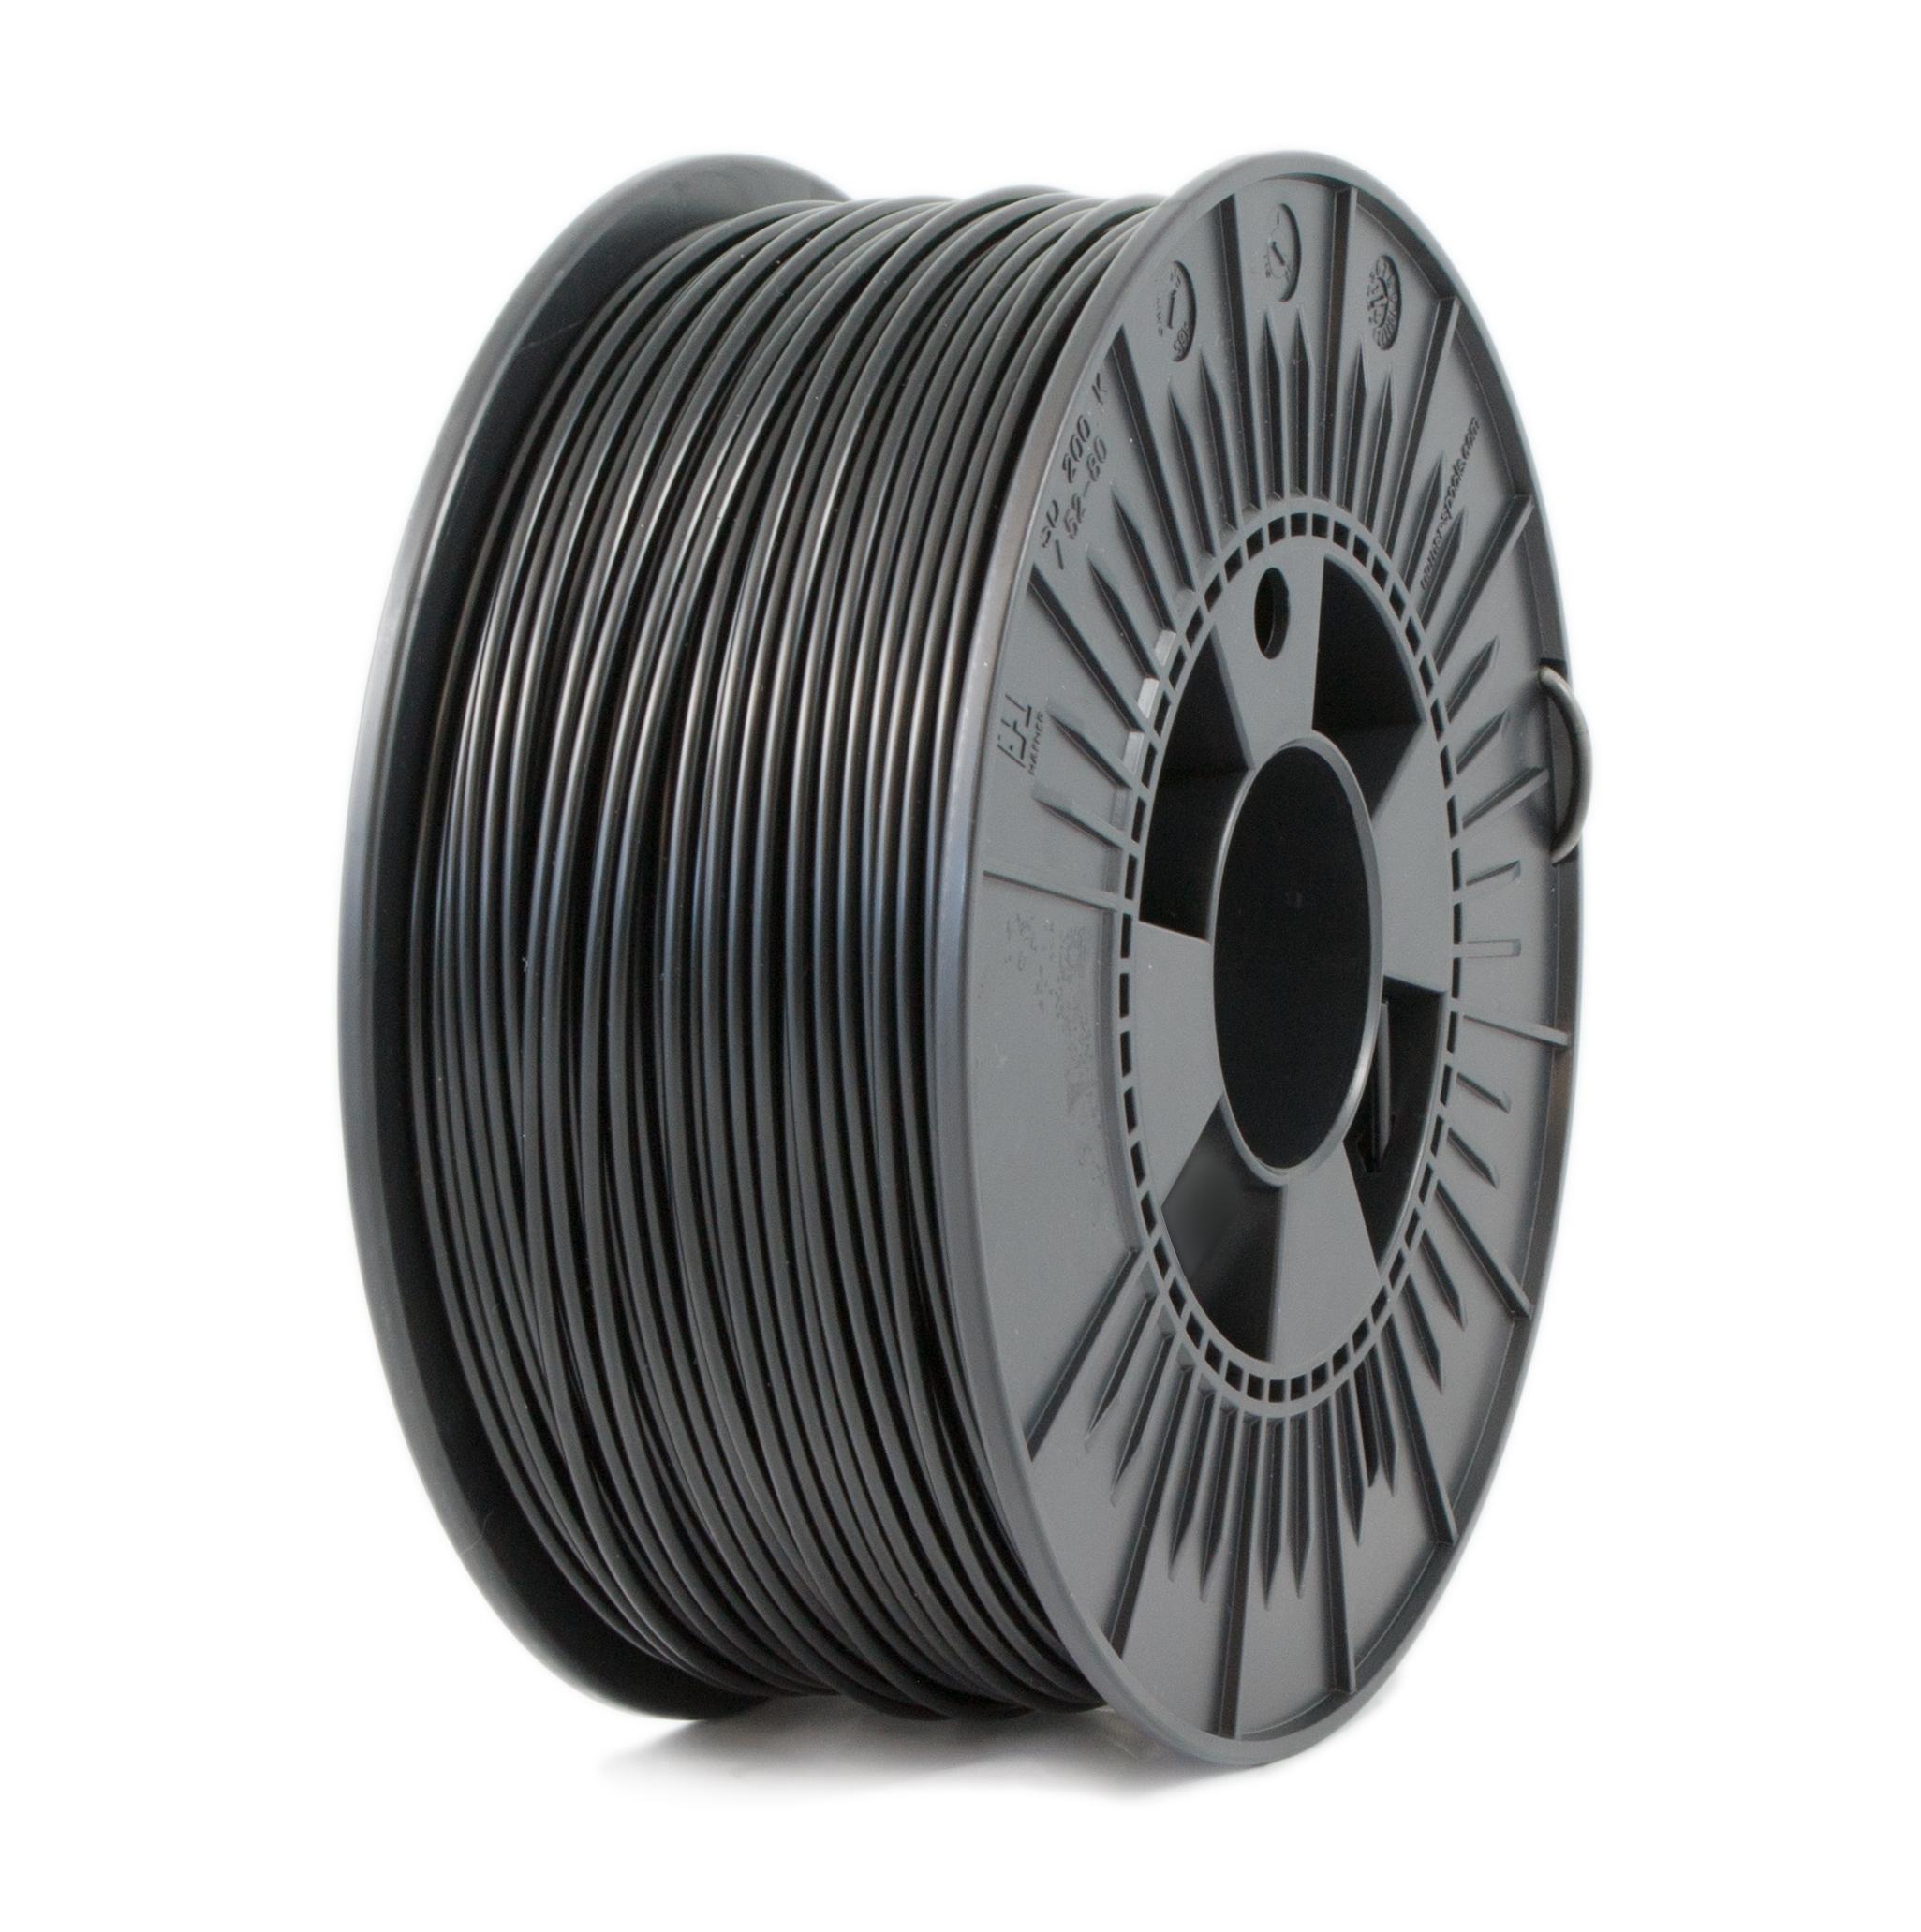 Filamentive  Black PLA 1.75 mm 4.5kg